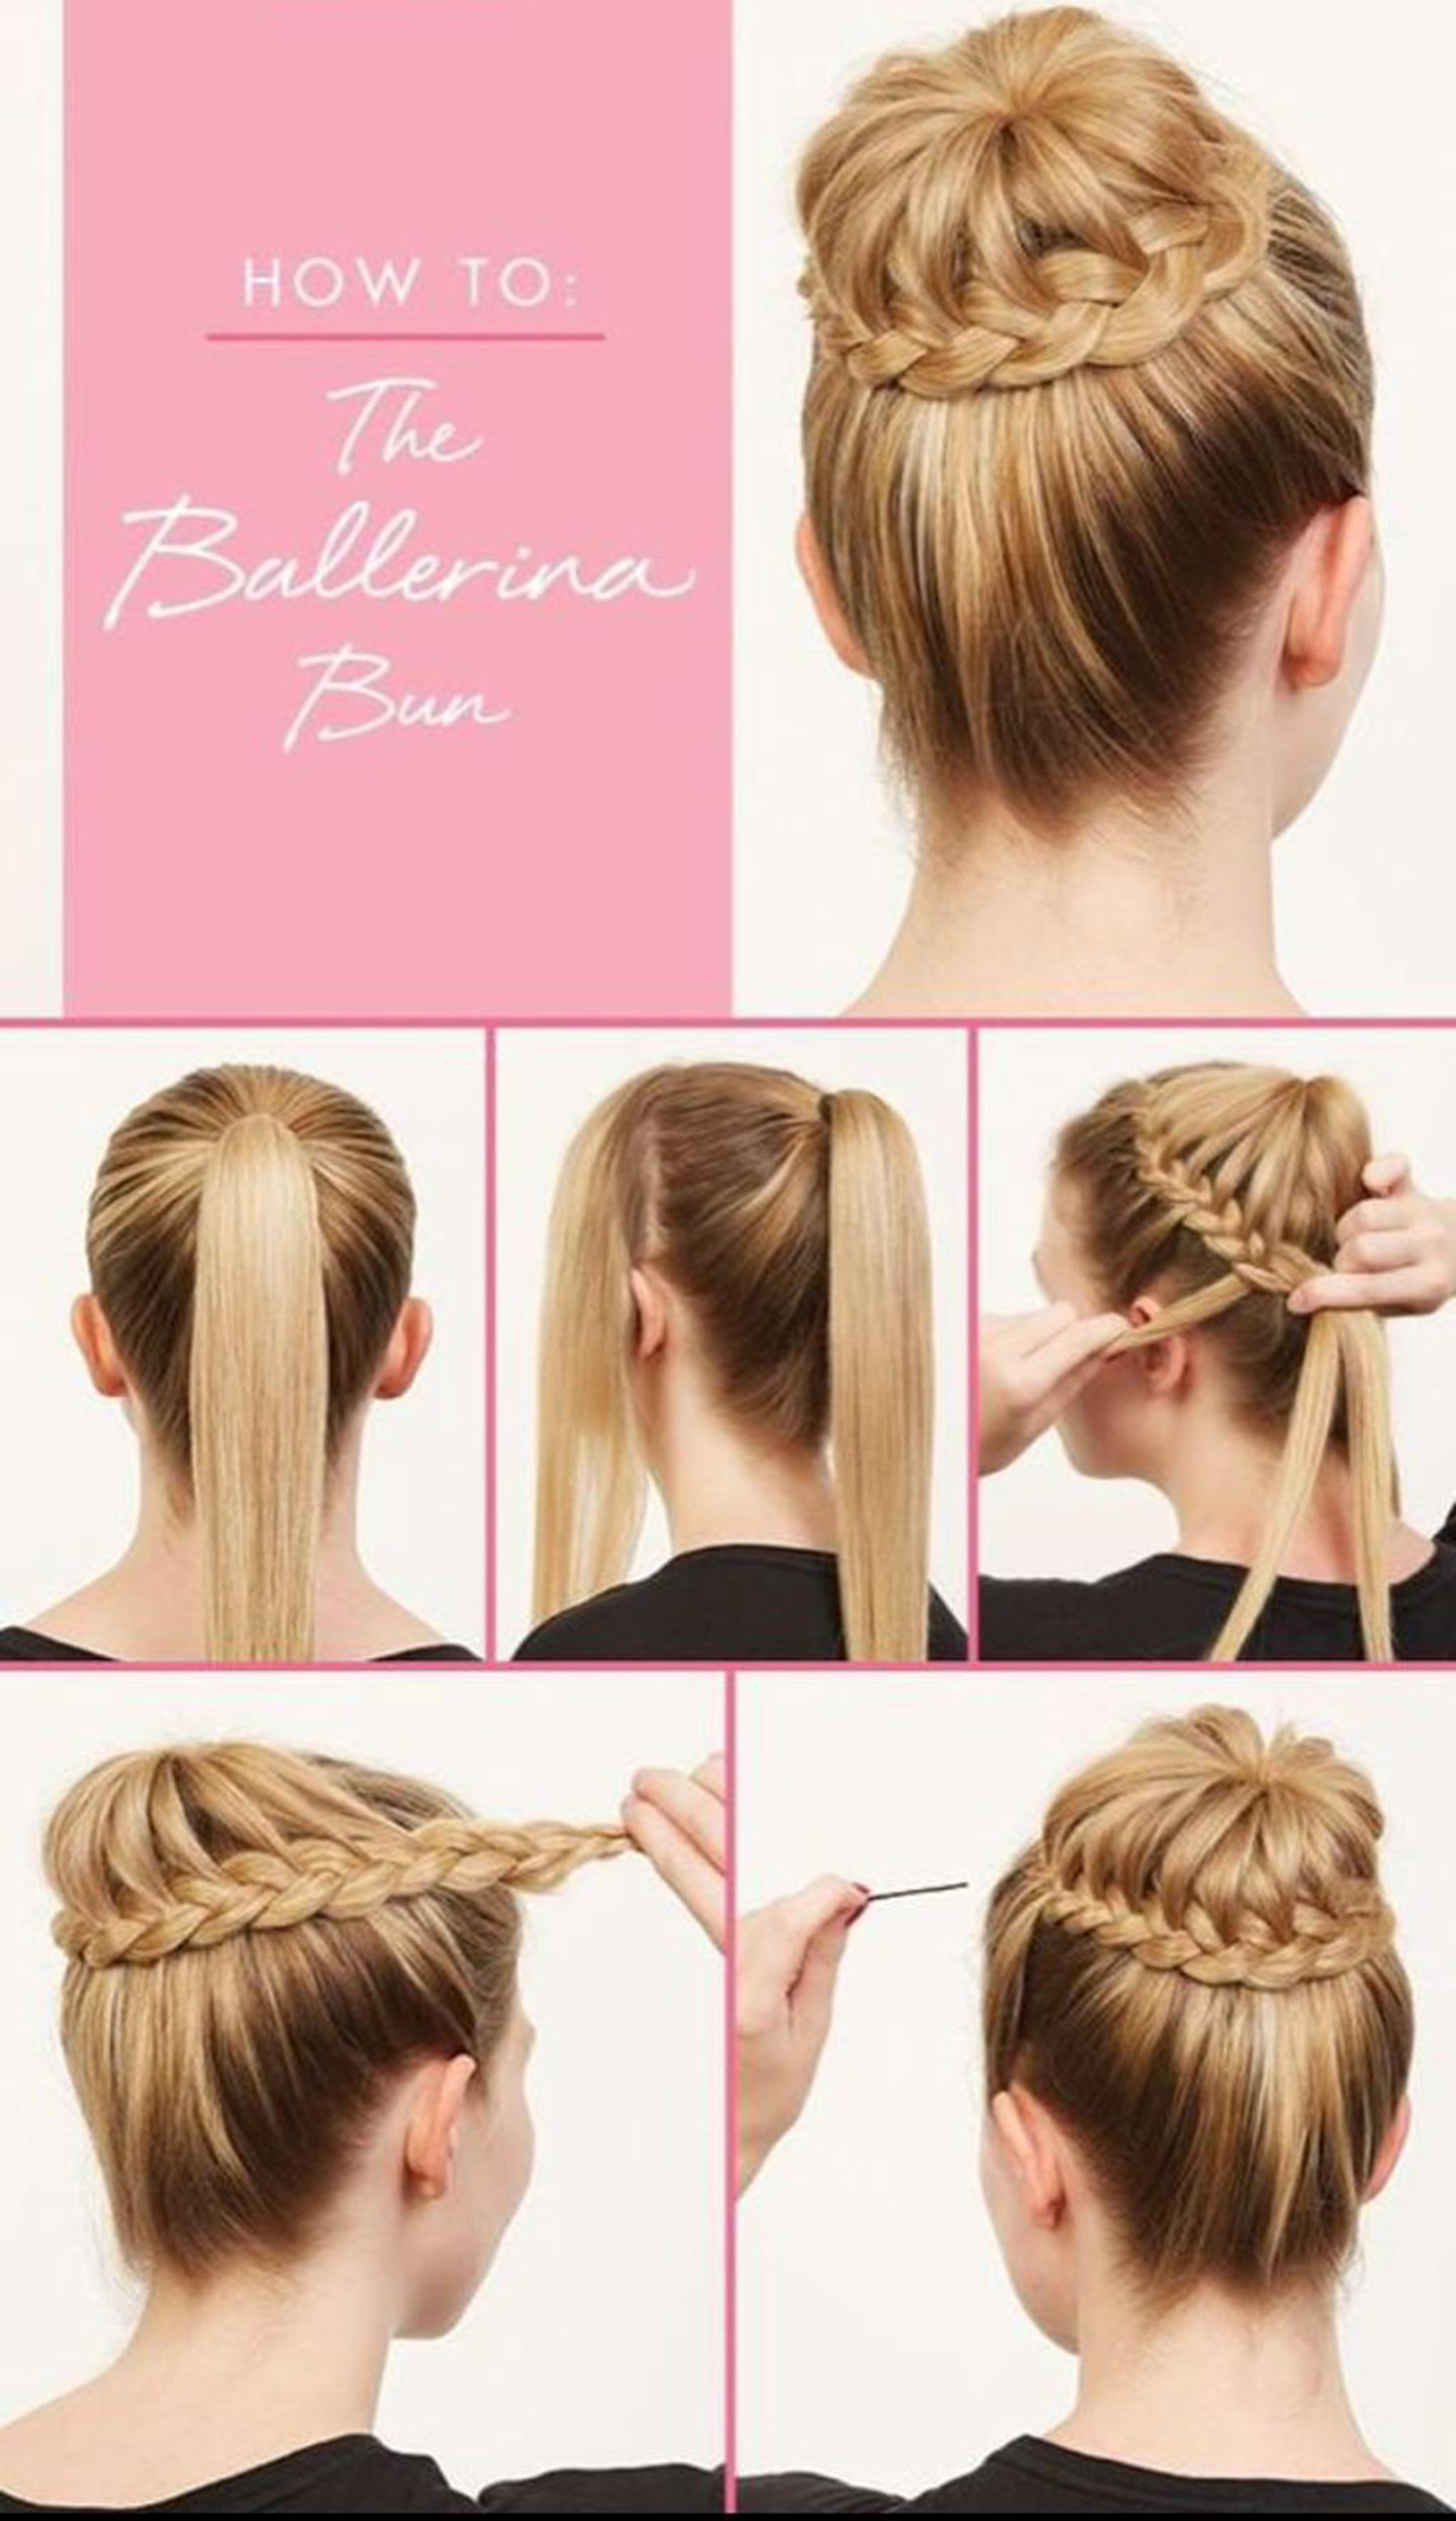 Top 10 Easy Braided Bun Hairstyle Tutorials For Every Hair ...